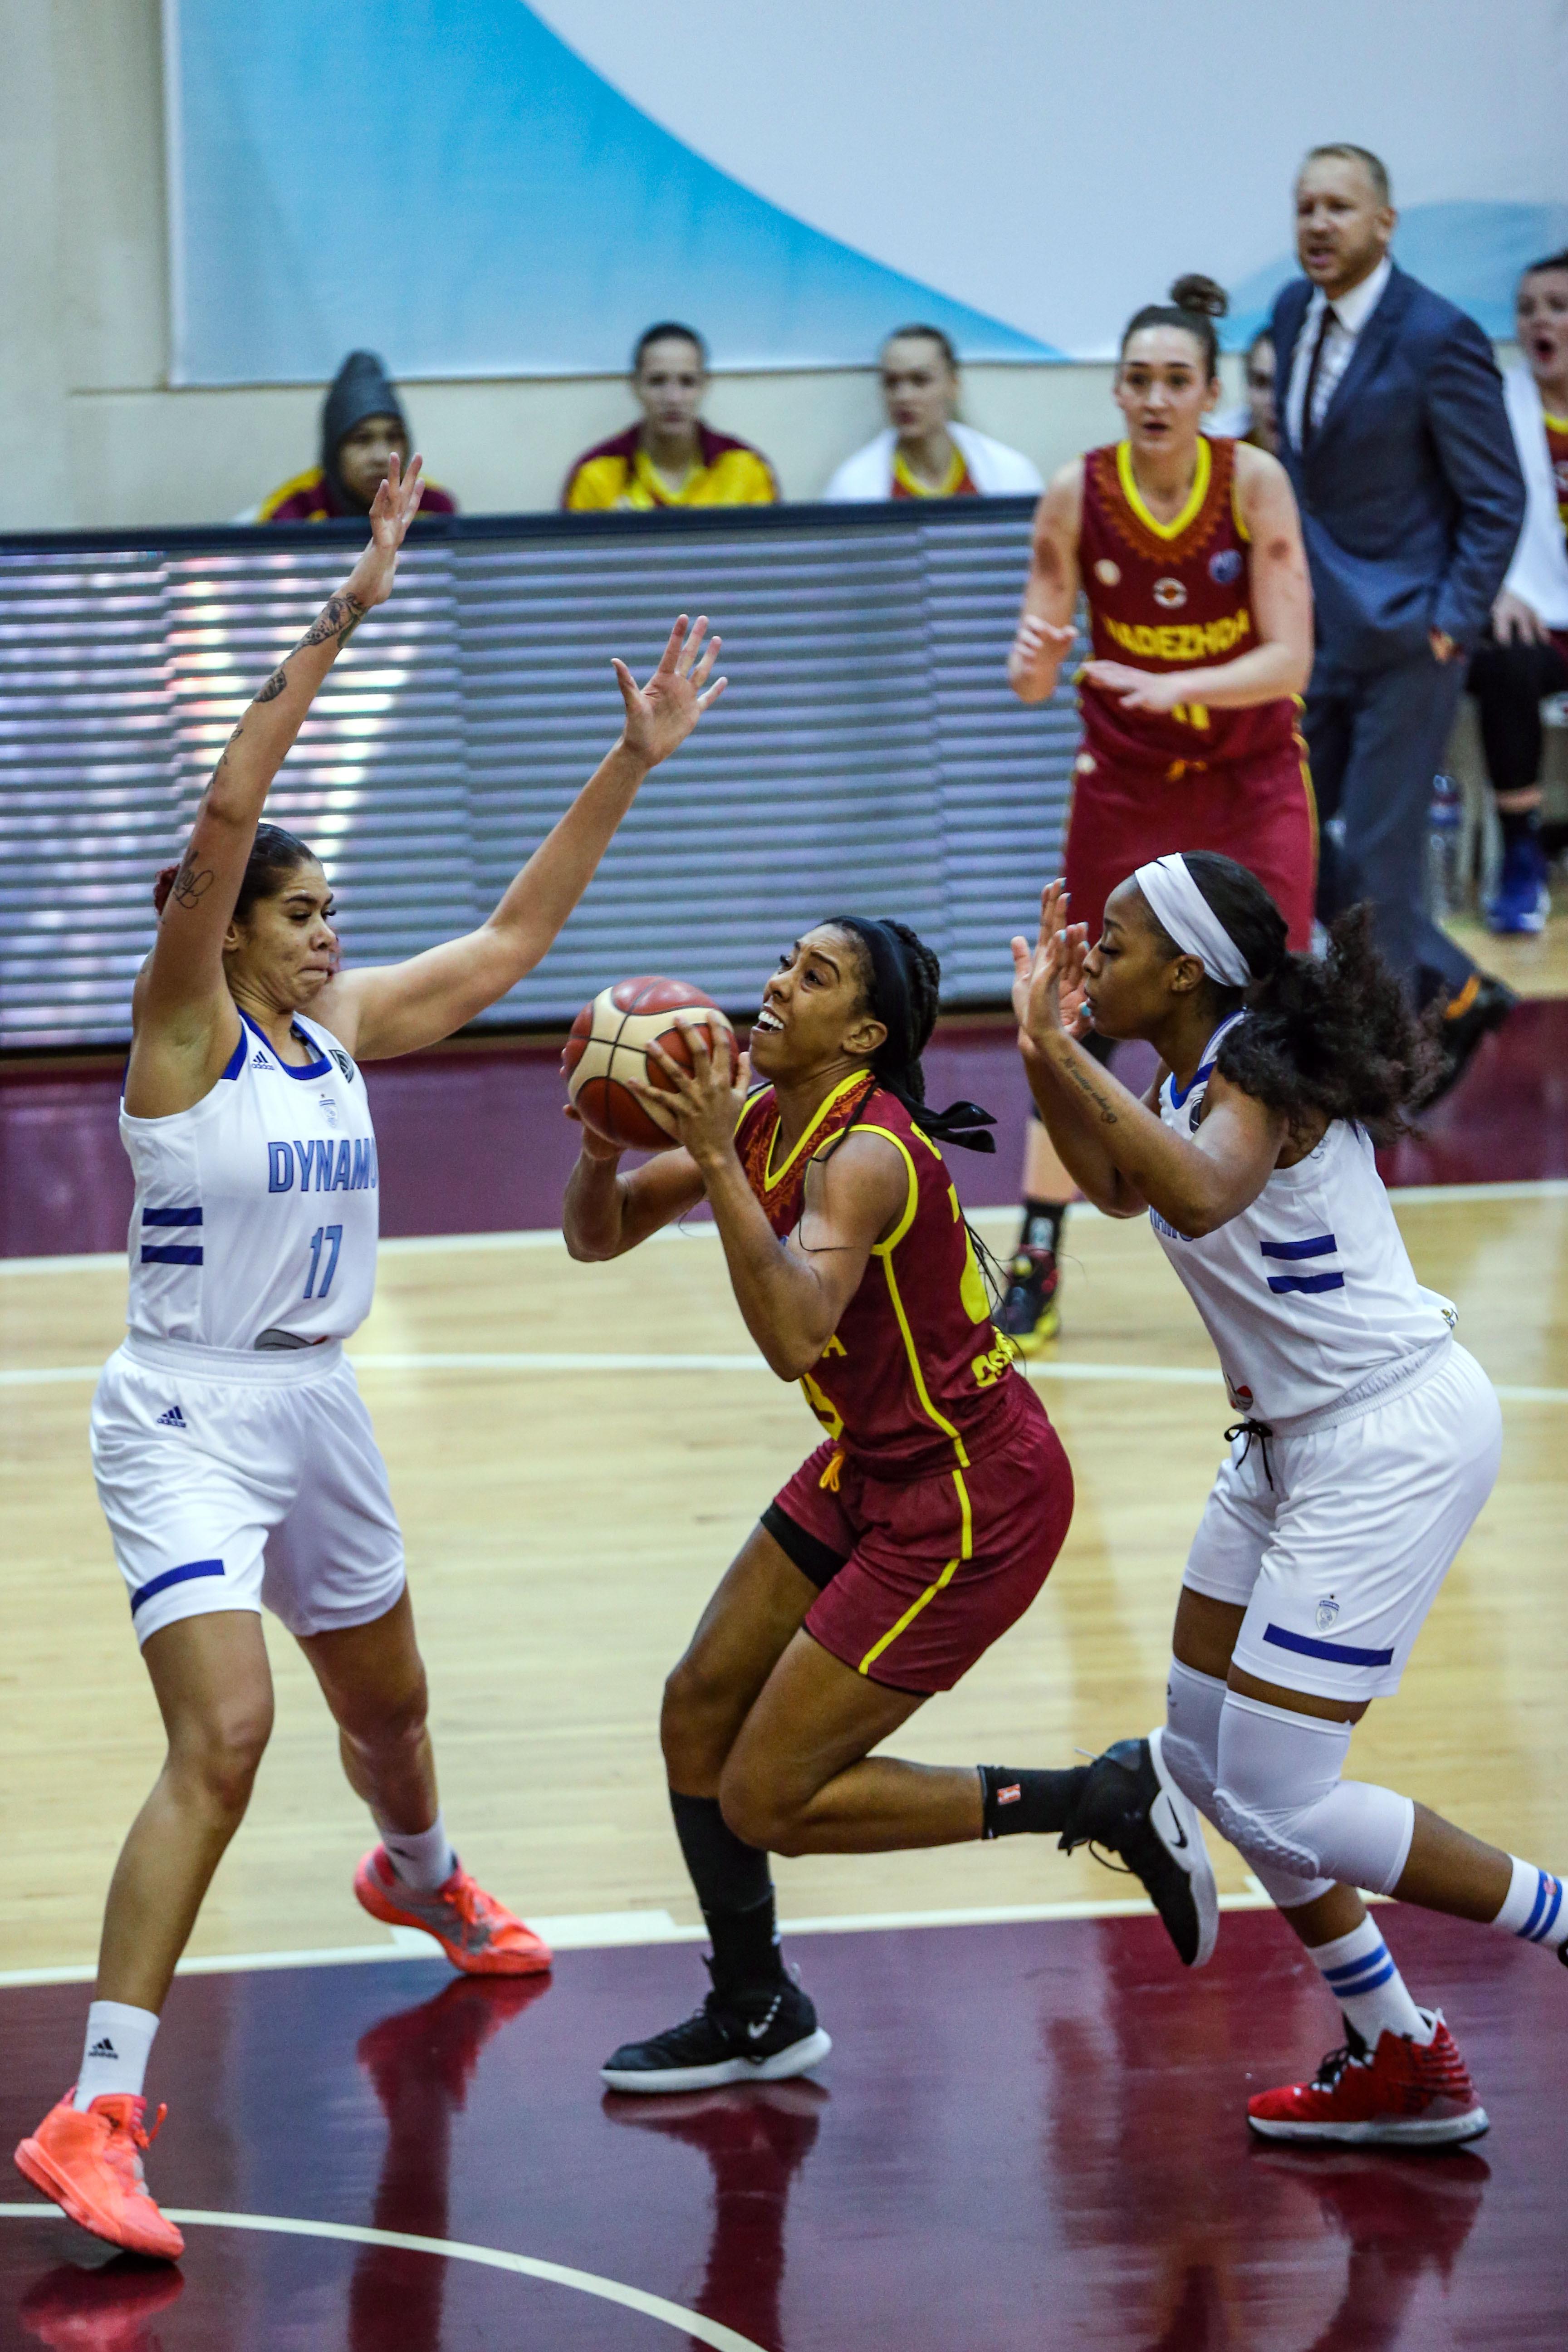 Dynamo Kursk v Nadezhda - FIBA EuroLeague Women